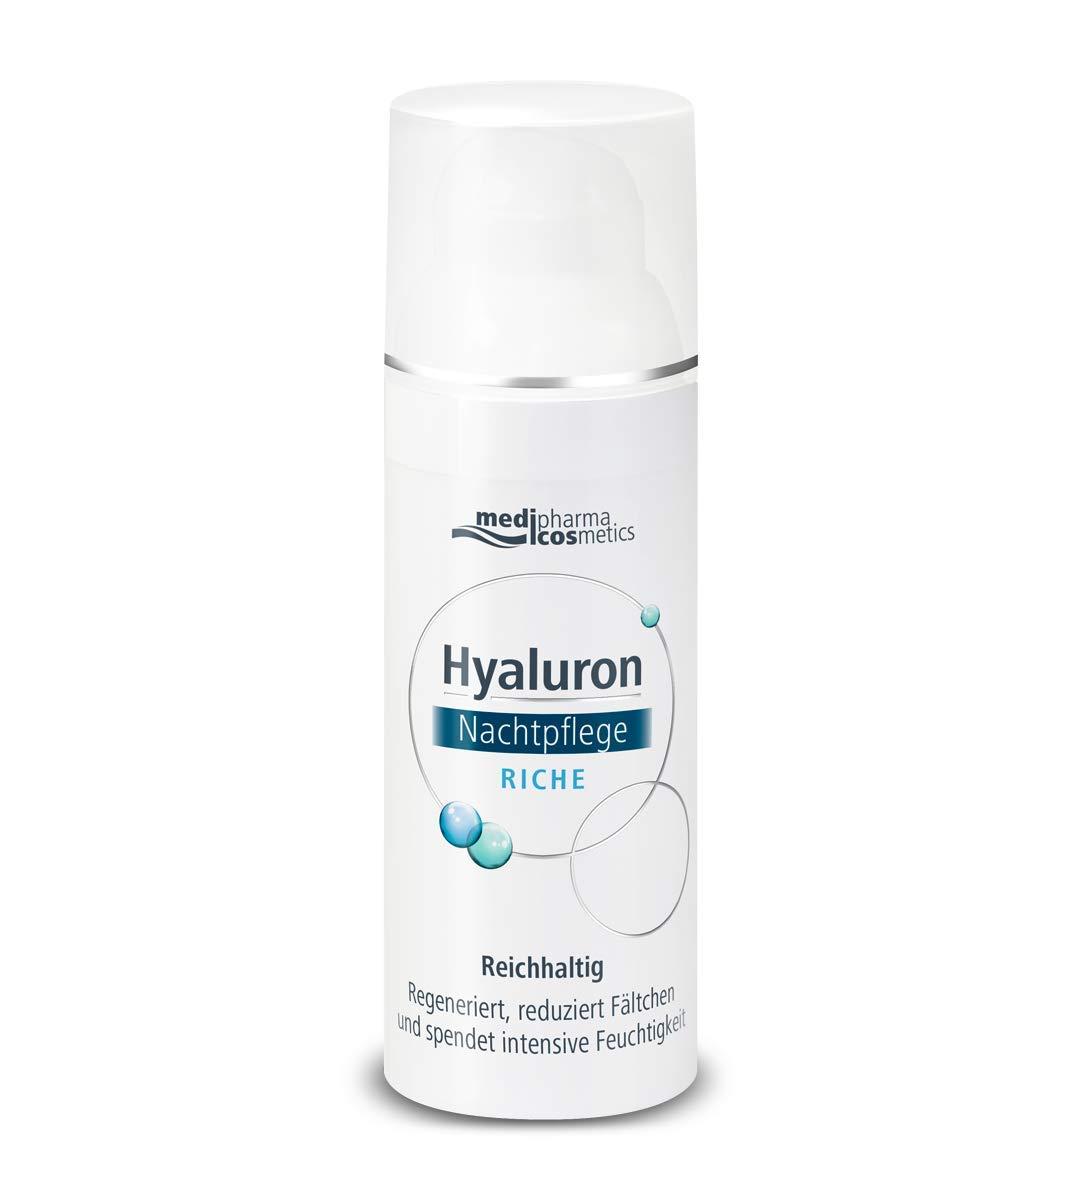 Medipharma Cosmetics Rich Night Care Cream!